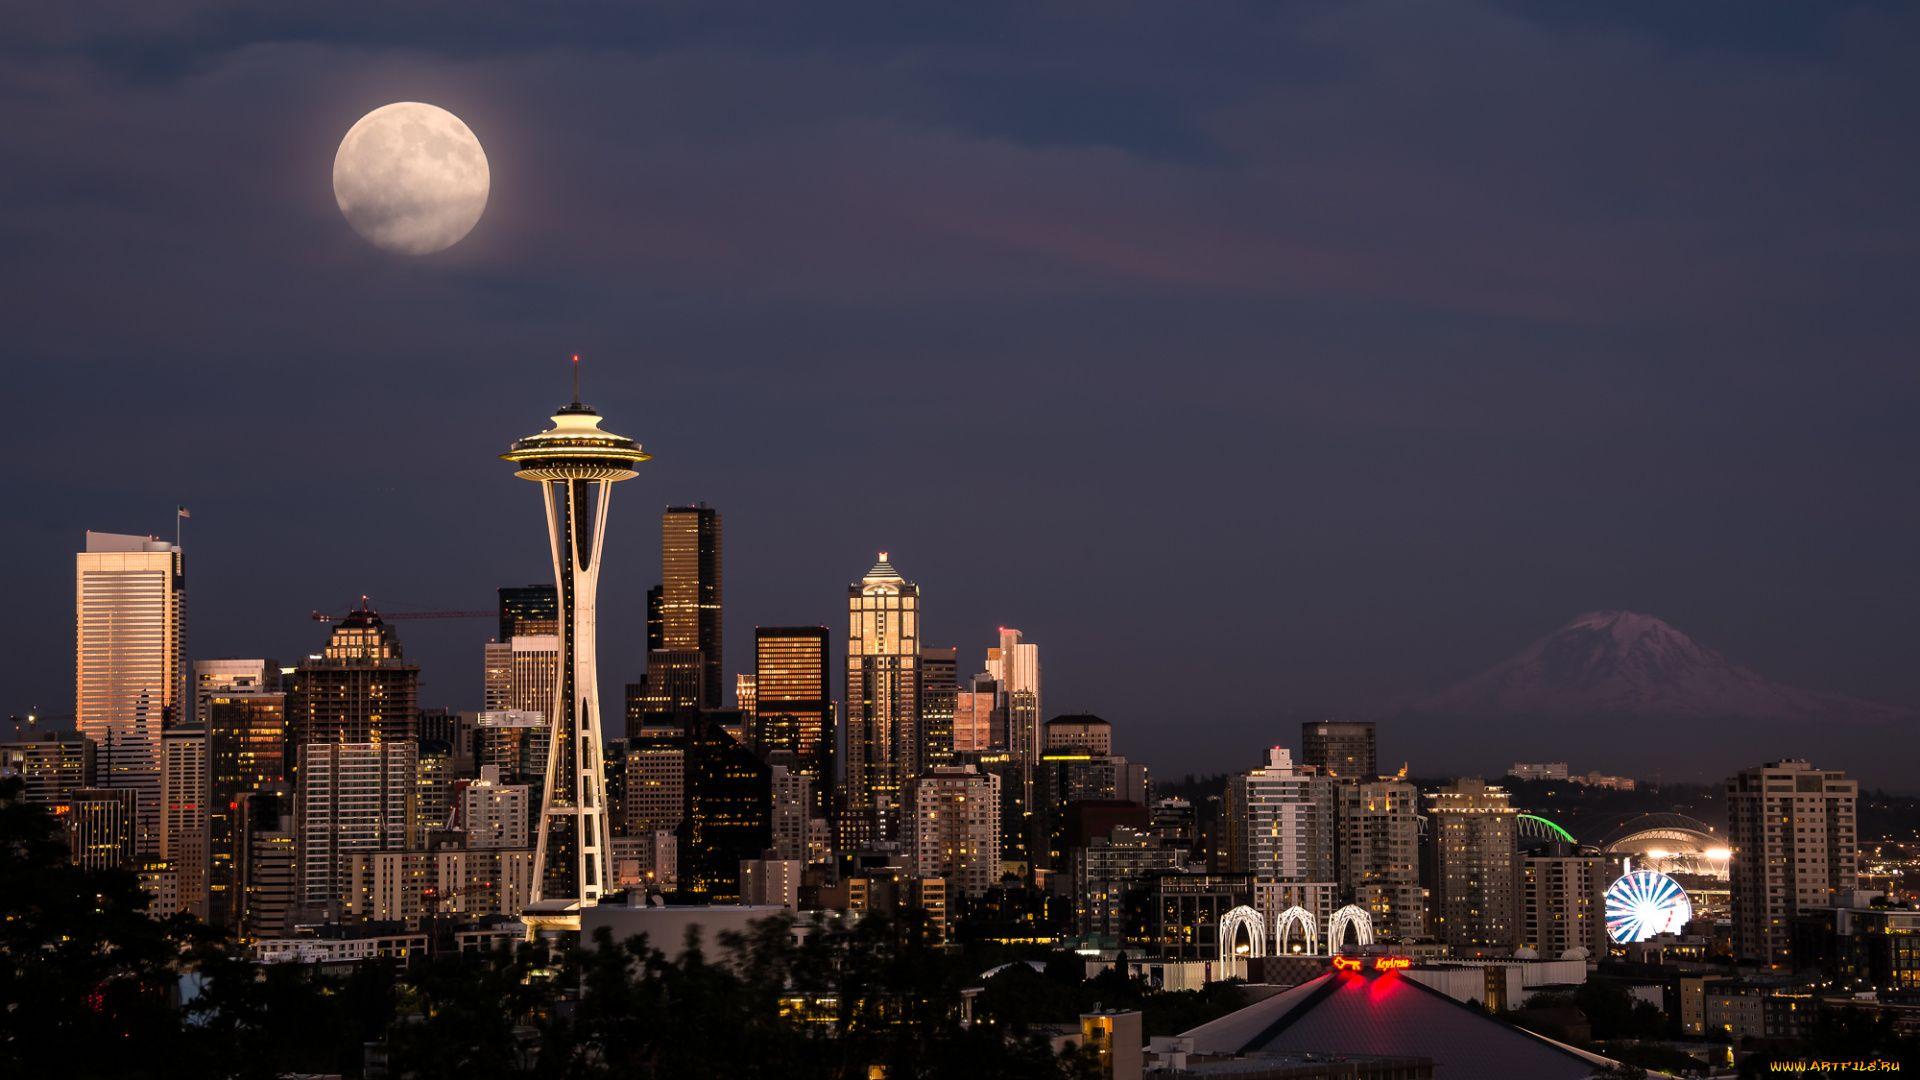 Seattle full hd image